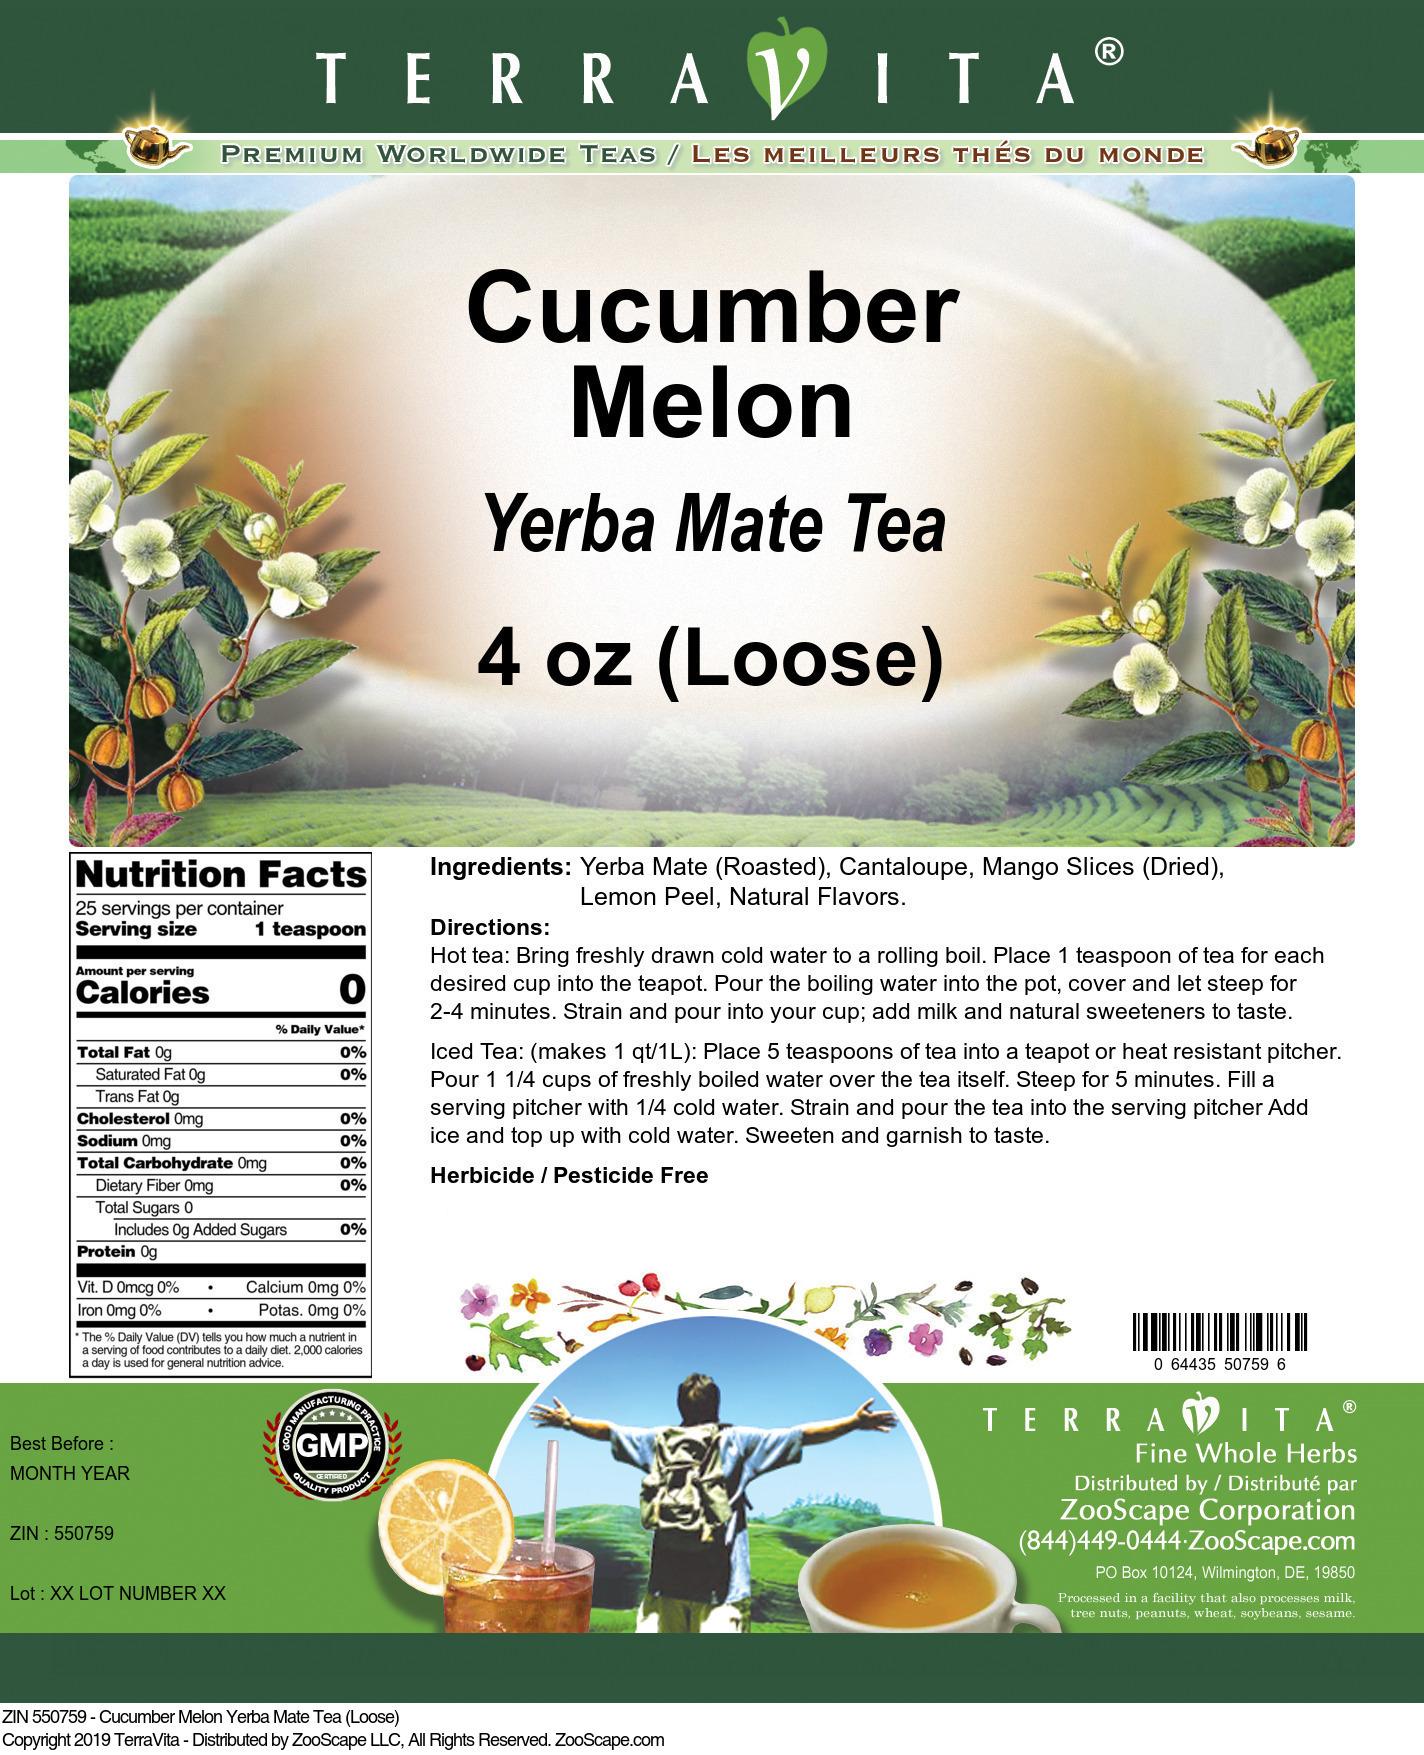 Cucumber Melon Yerba Mate